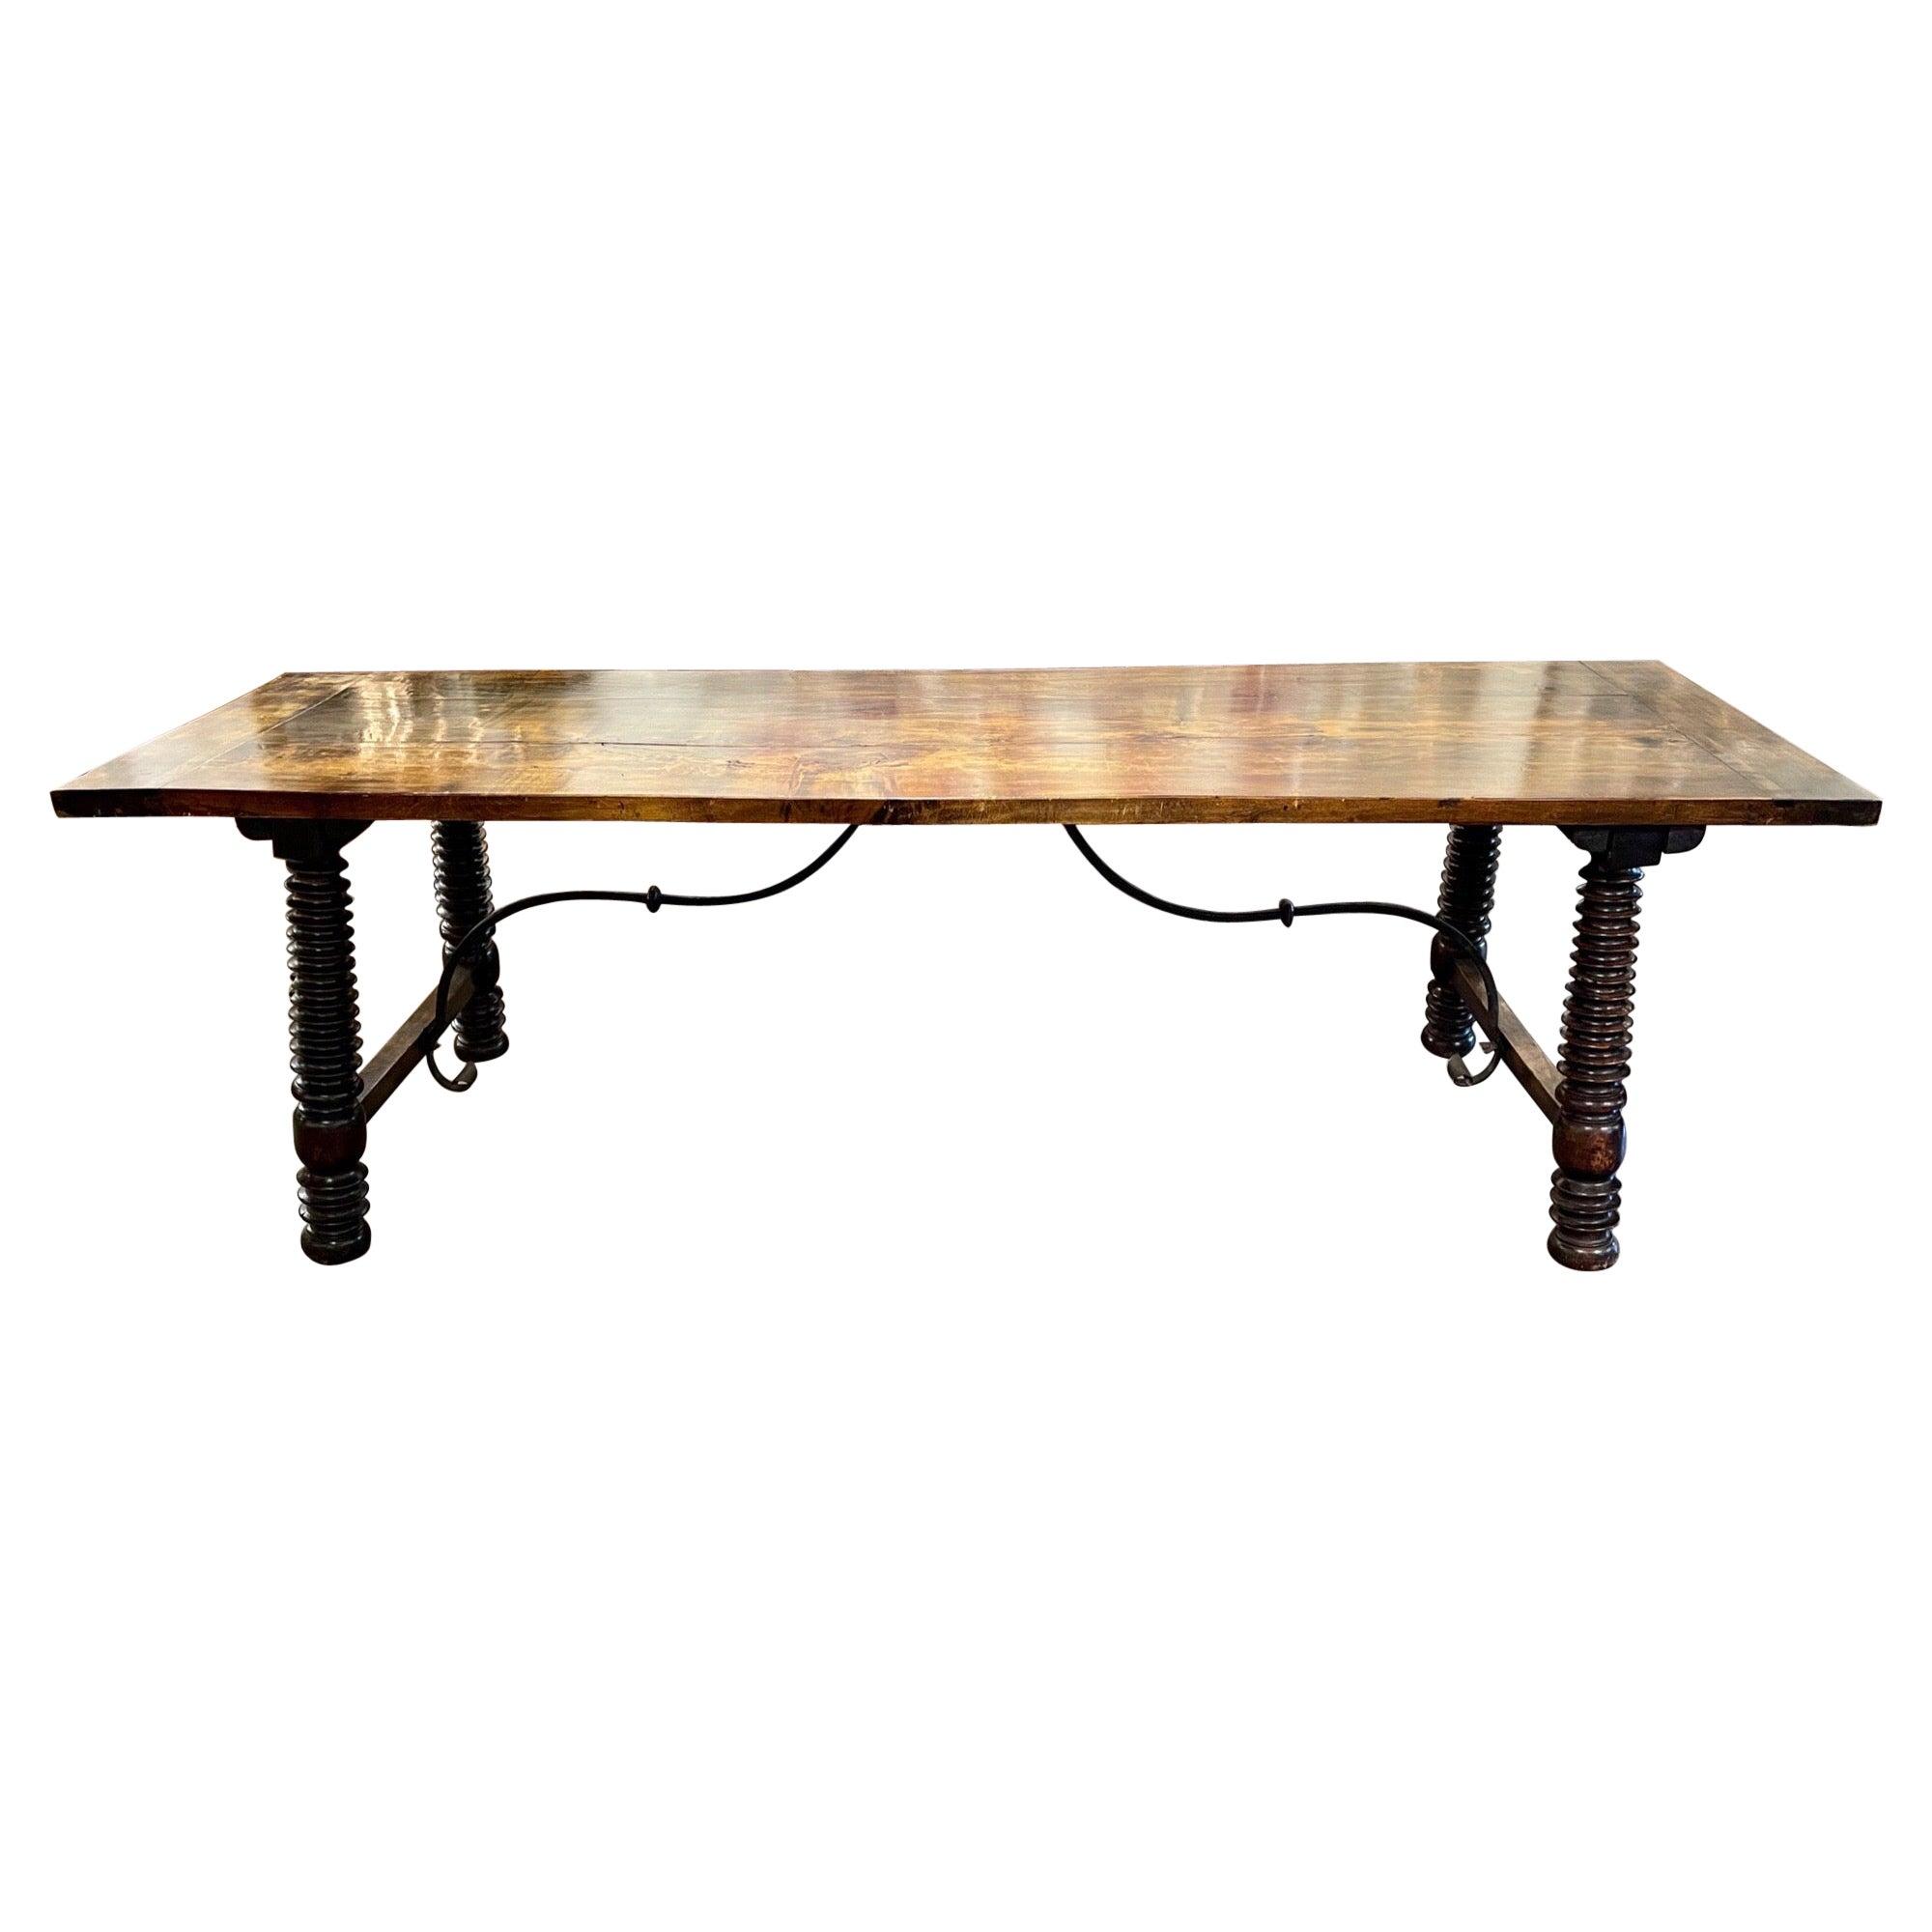 19th Century Portuguese Carved Walnut Twist Leg Trestle Table